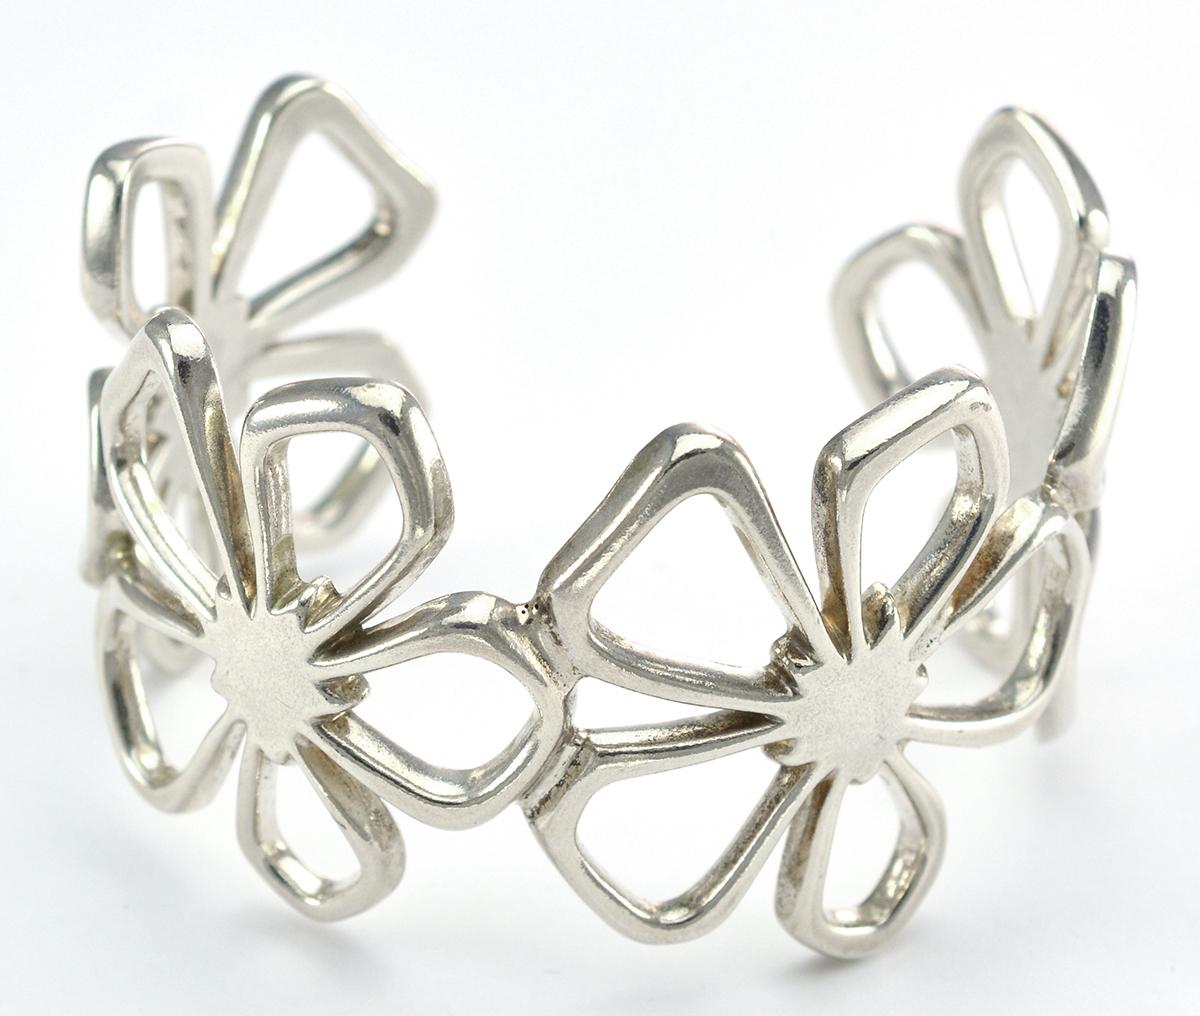 Tiffany Co 925 Silver Flower Design Cuff Style Bangle Bracelet